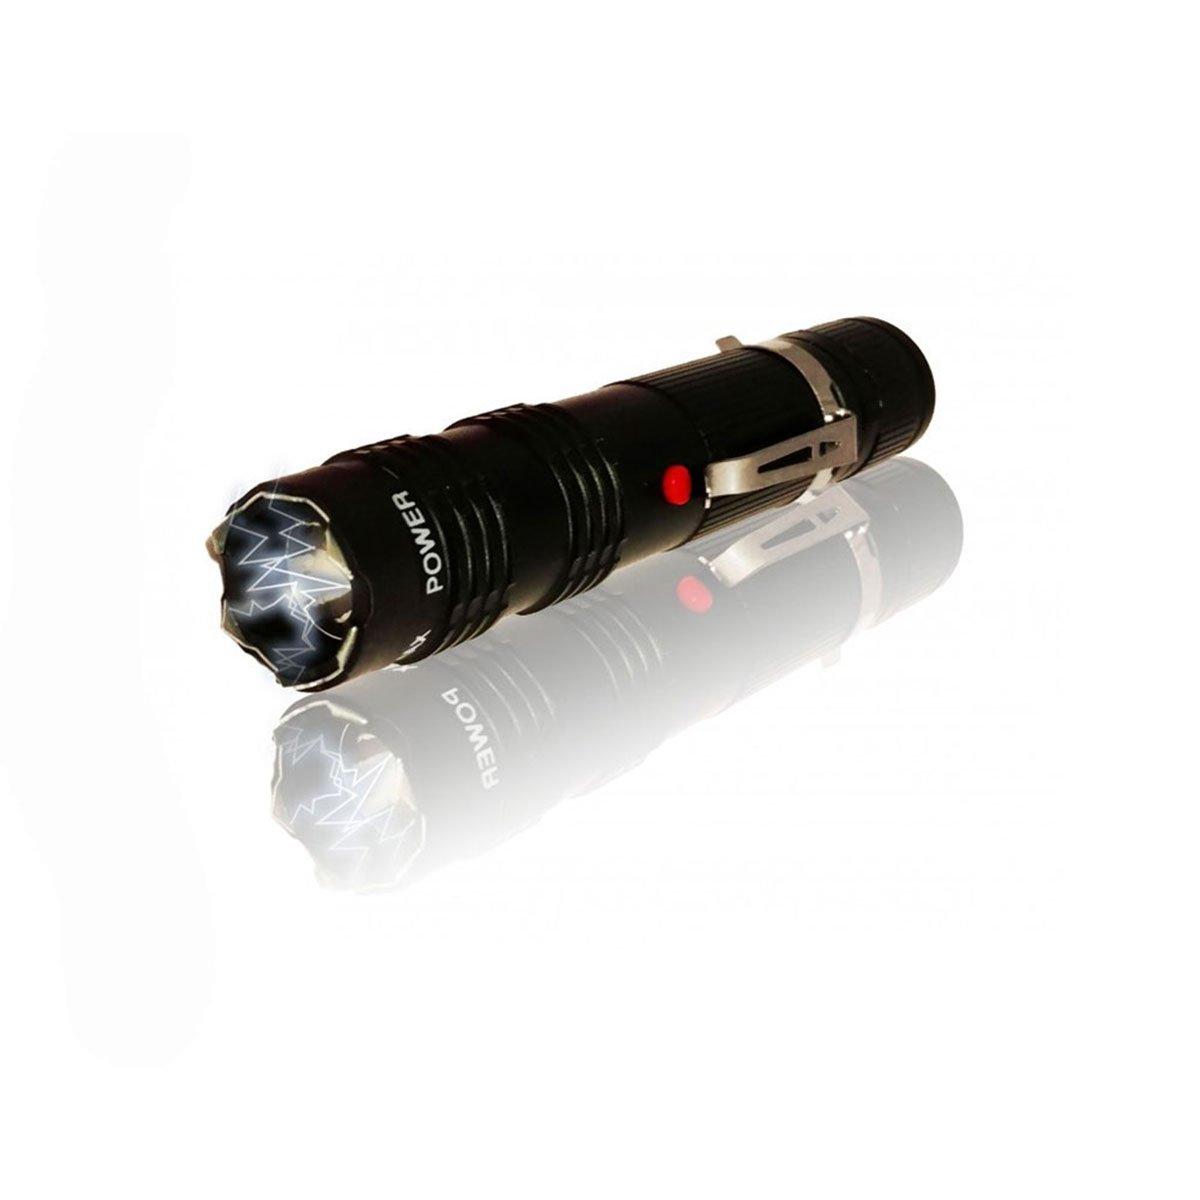 ALPHA FORCE Stun Gun - EL17- 250,000 Police Tactical LED Flashlight Quadruple Shock Prongs (Black)